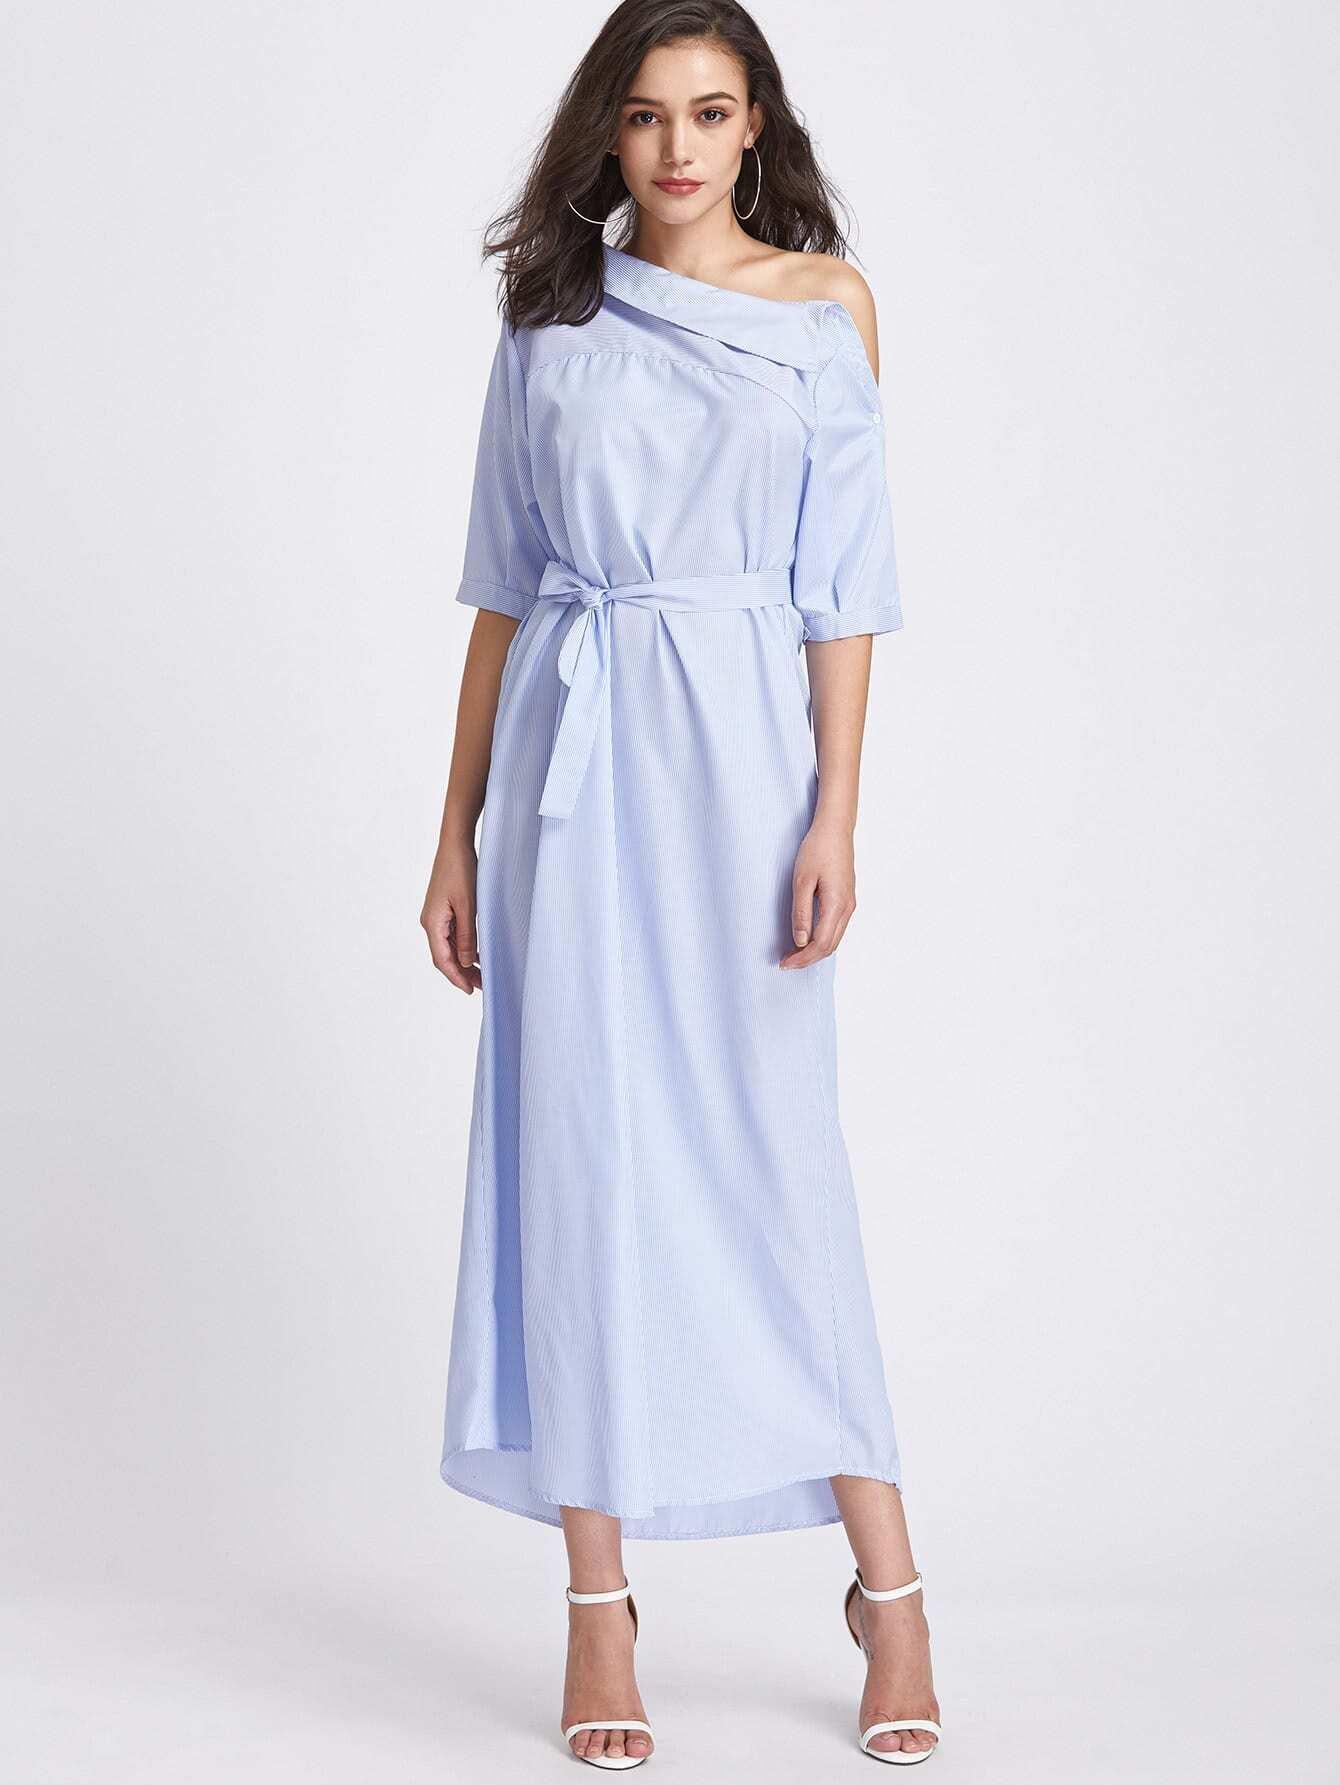 Pinstripe Asymmetrical Off Shoulder Self Tie Dress